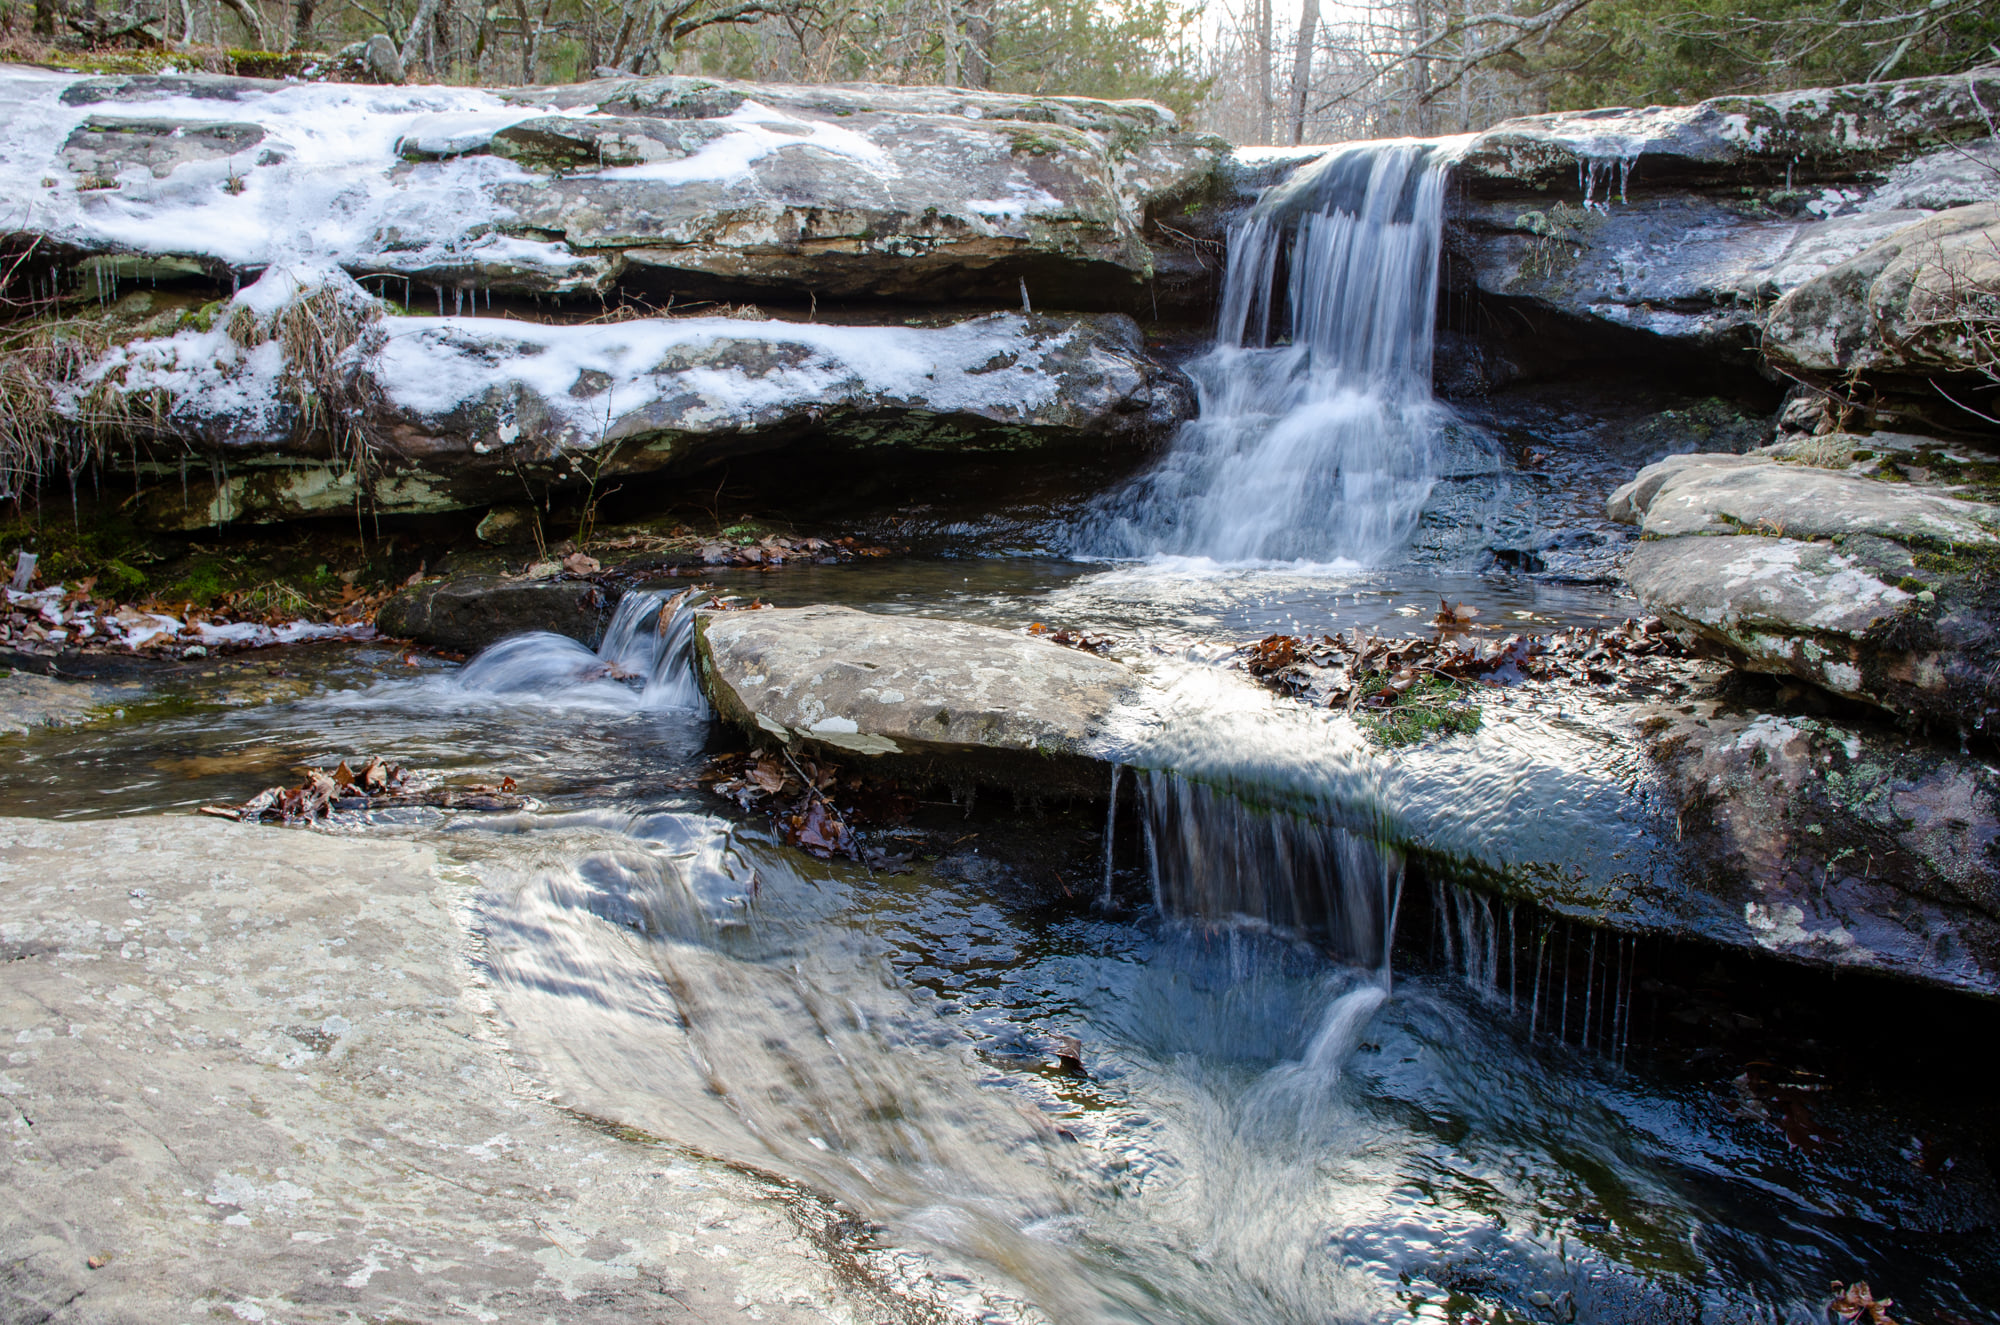 Hideout Hollow Trail